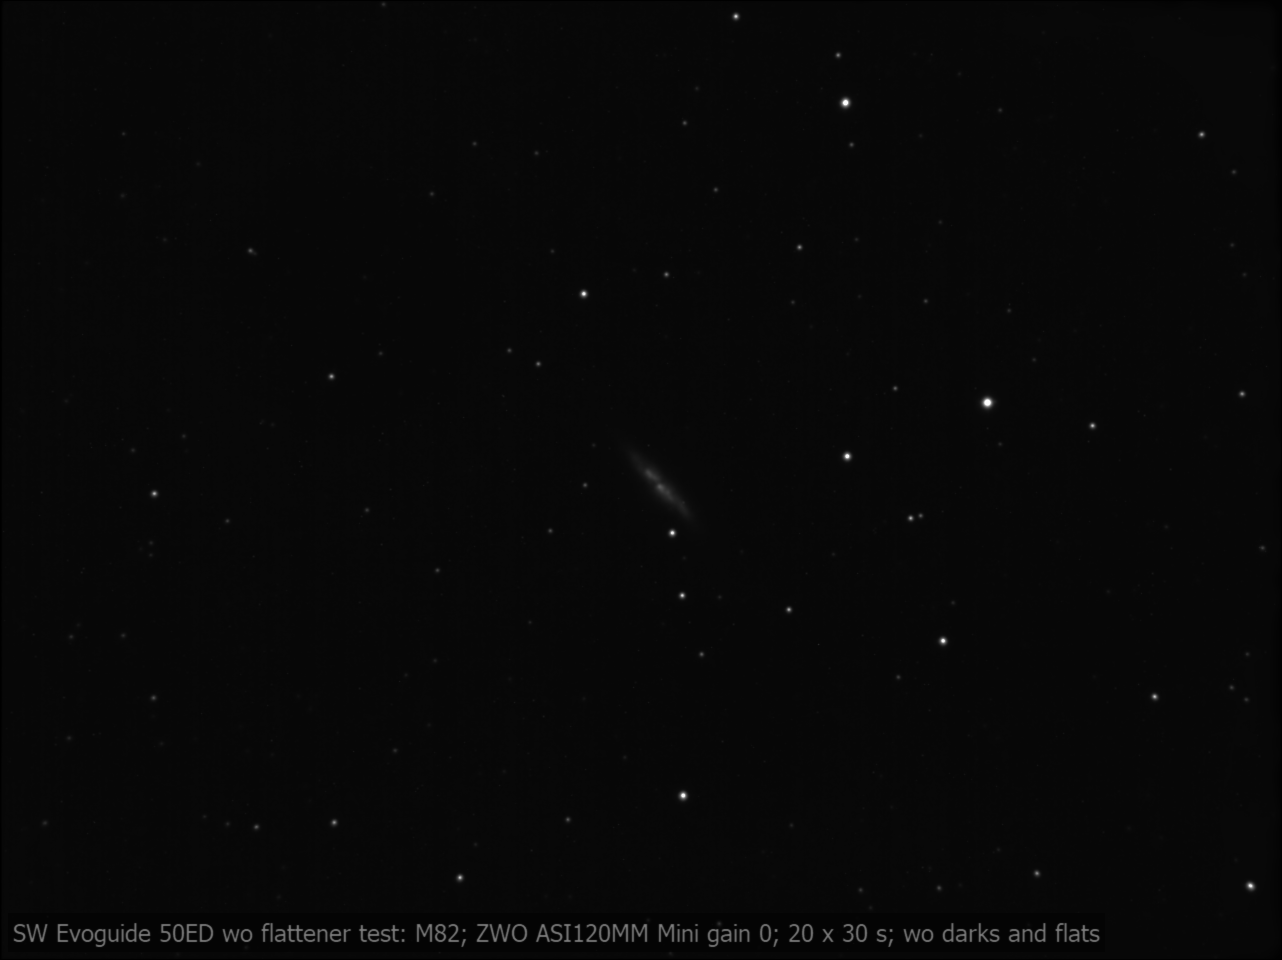 M82_description.png.e82f4c0e04f5f9e40617bbcc2d0a7520.png